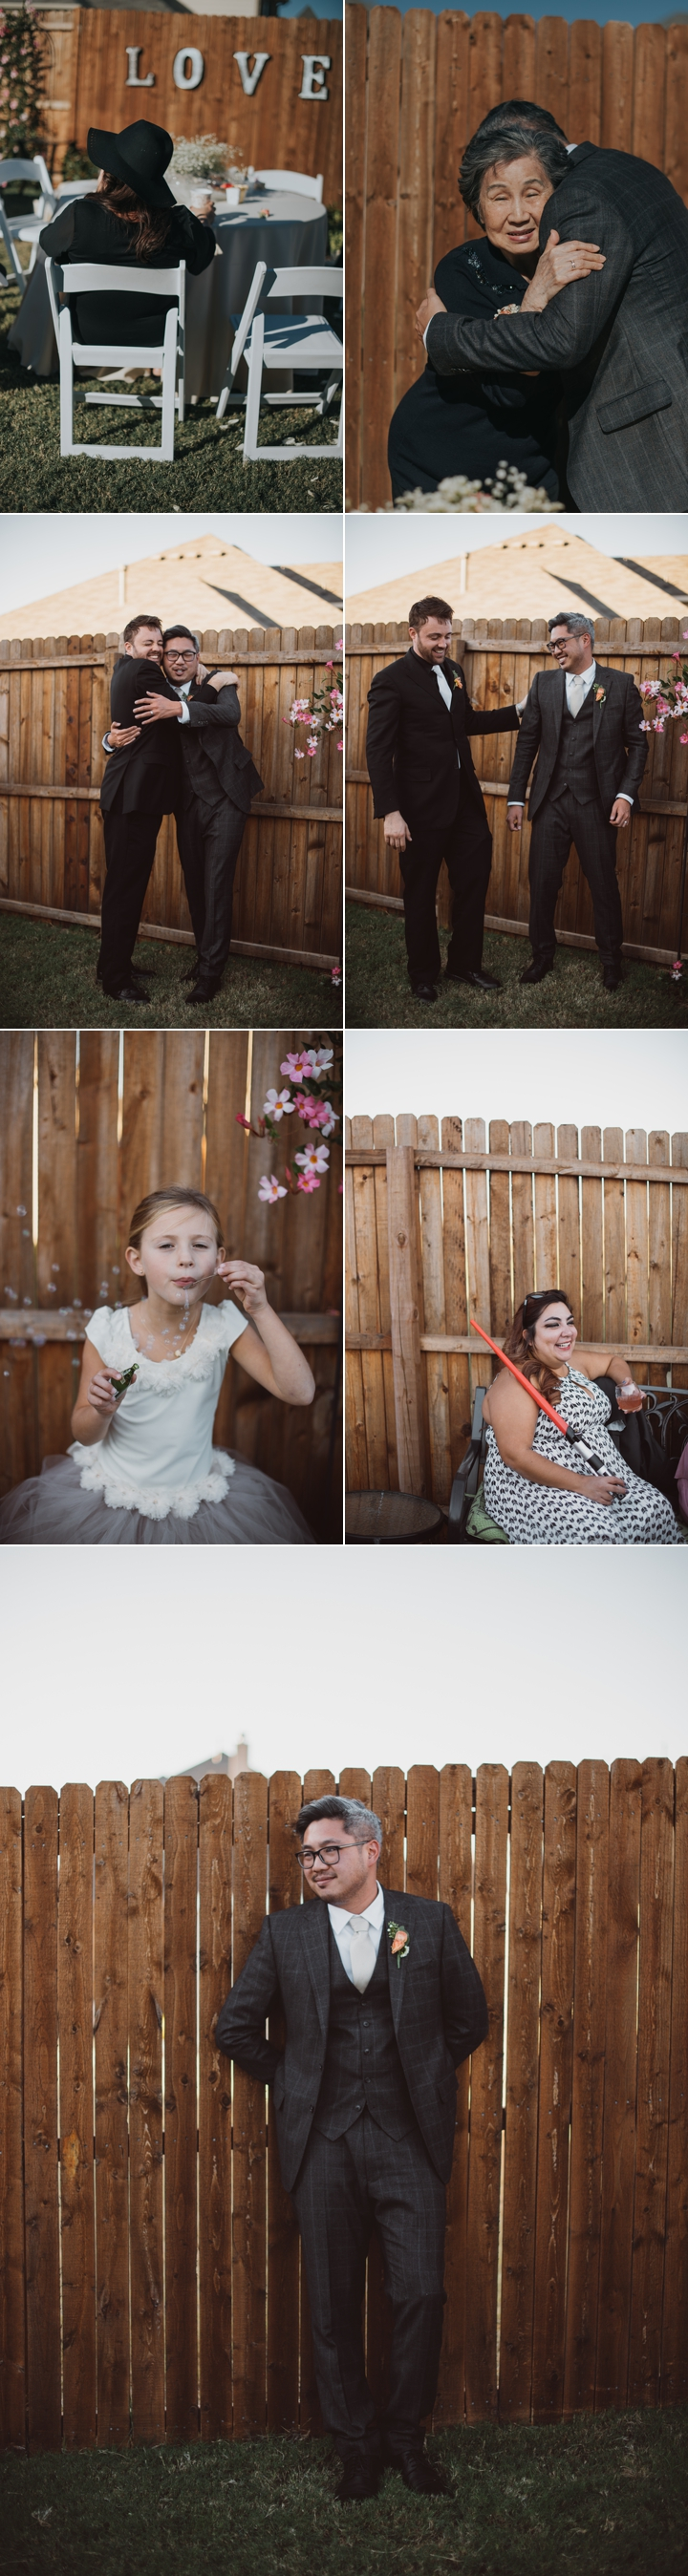 dallas-wedding-photographers-vb 16.jpg